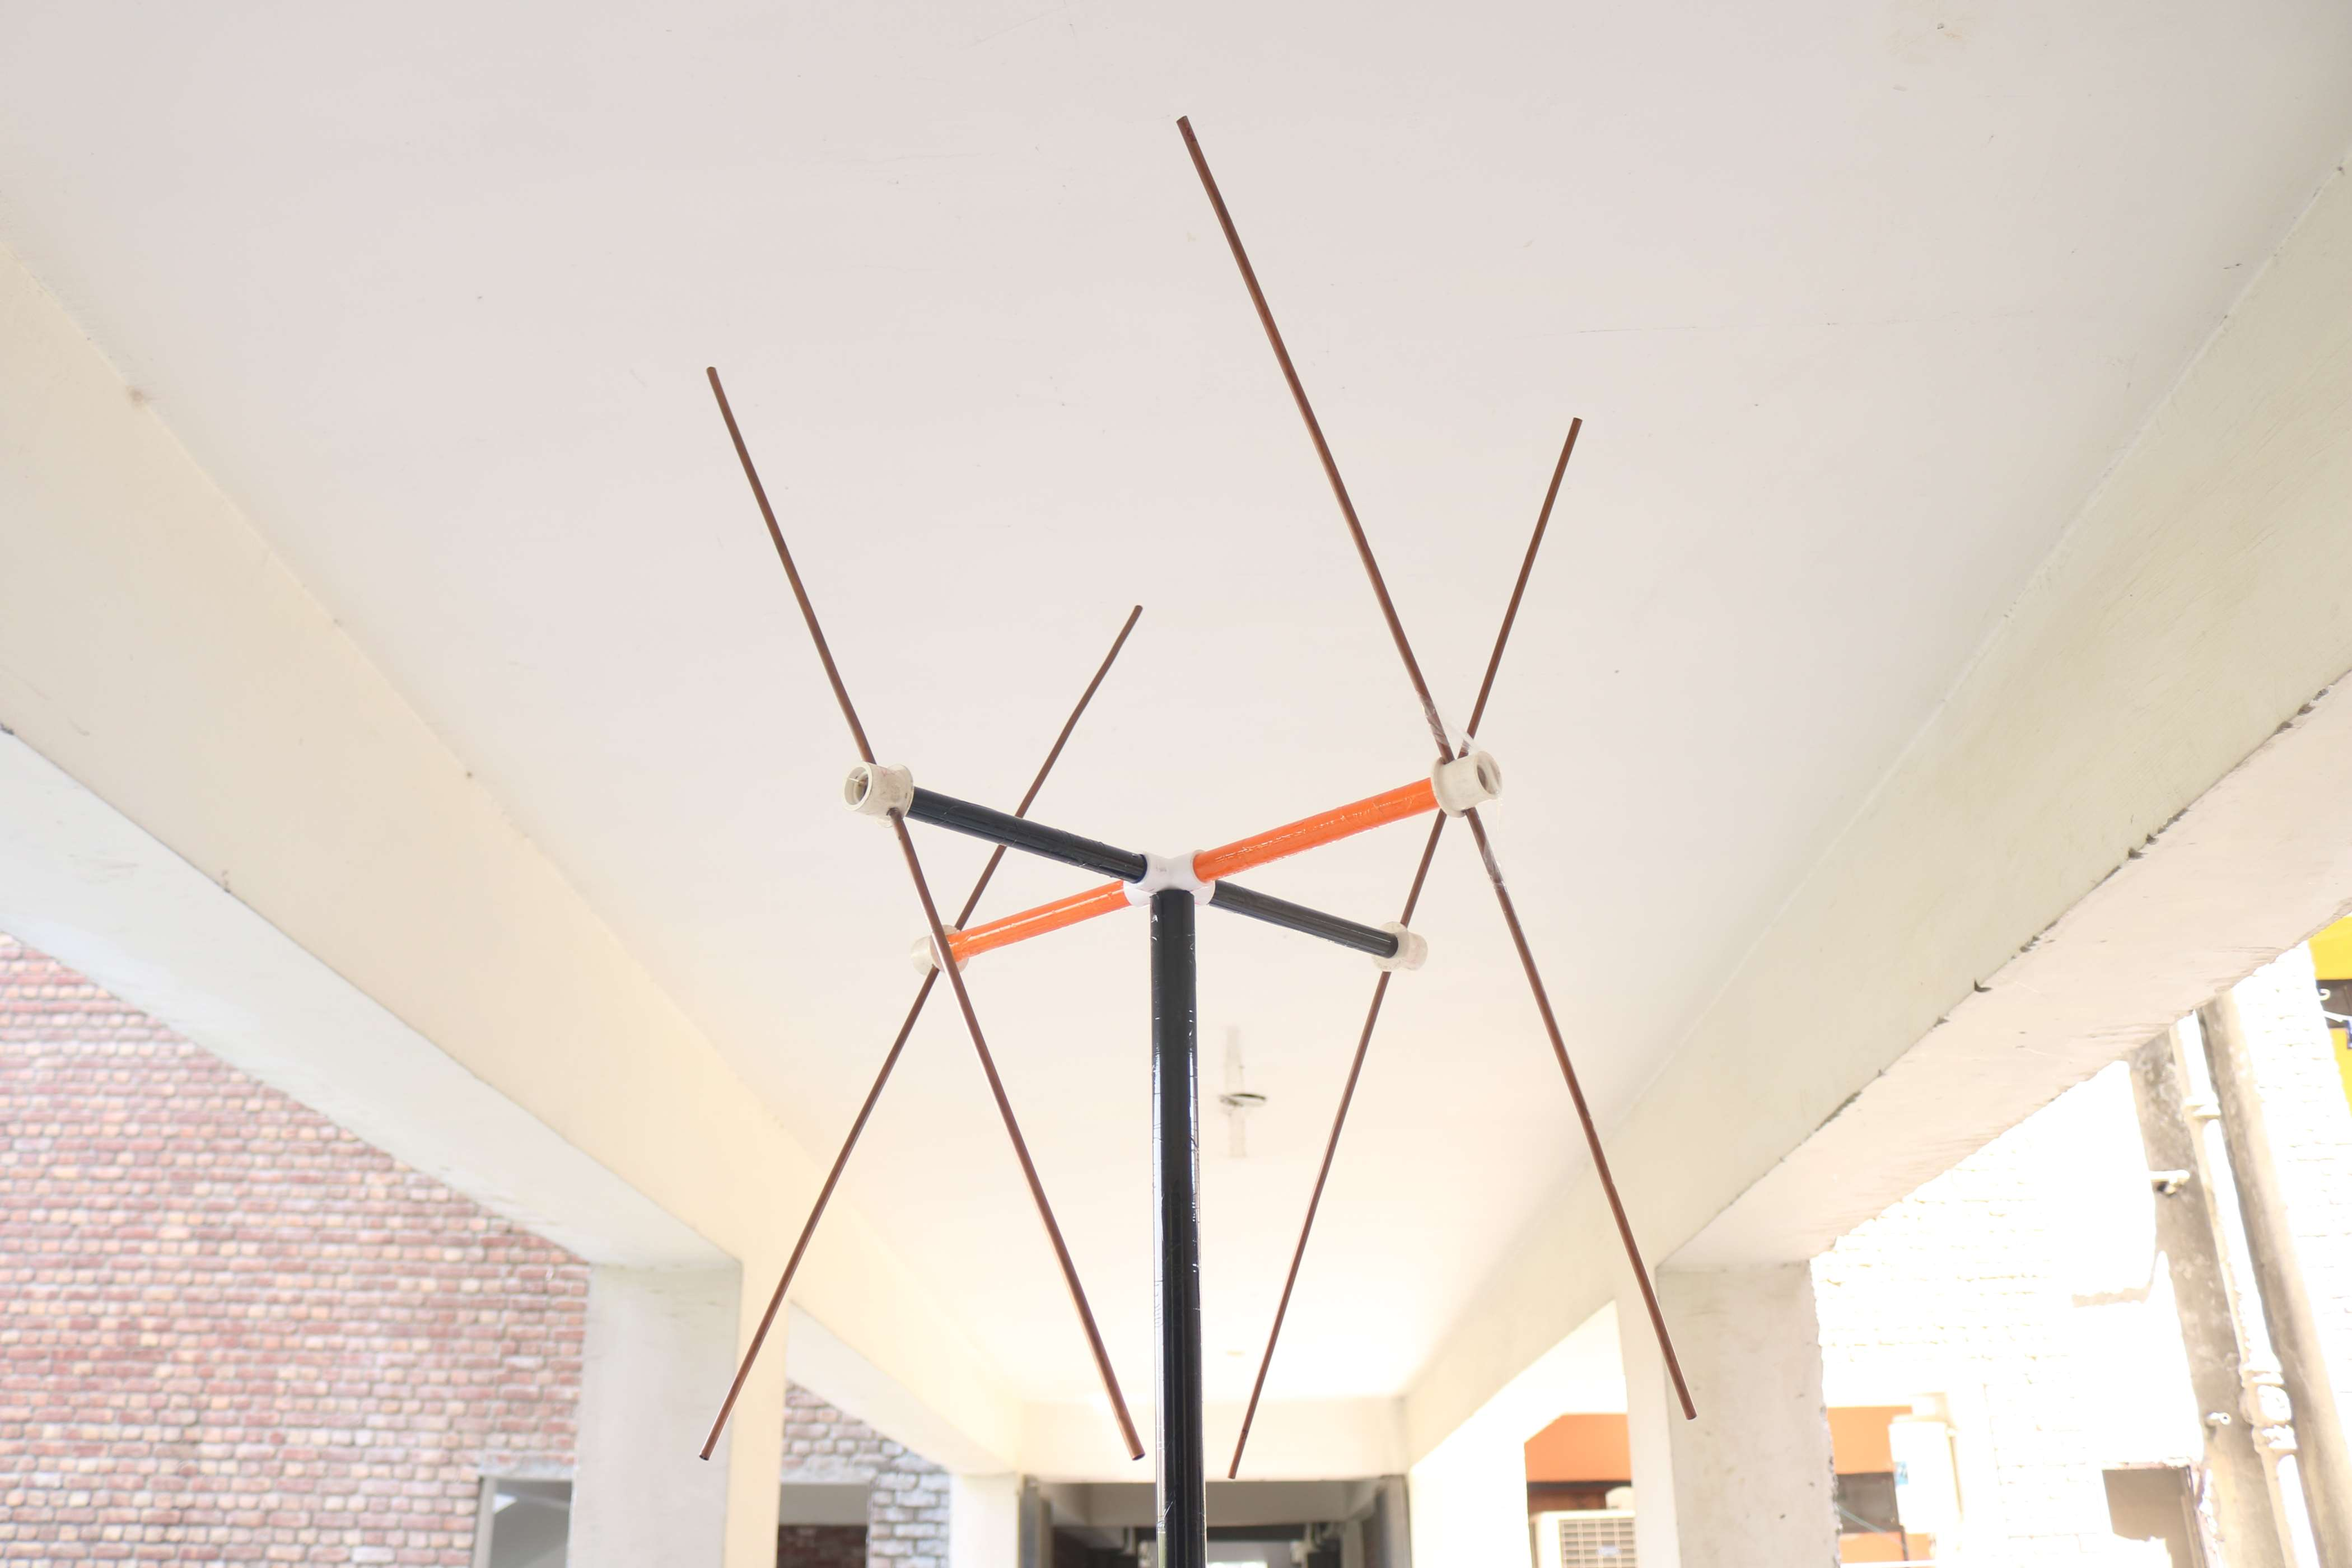 Double Cross Antenna for NOAA / METEOR Weather Satellite : 137 MHZ